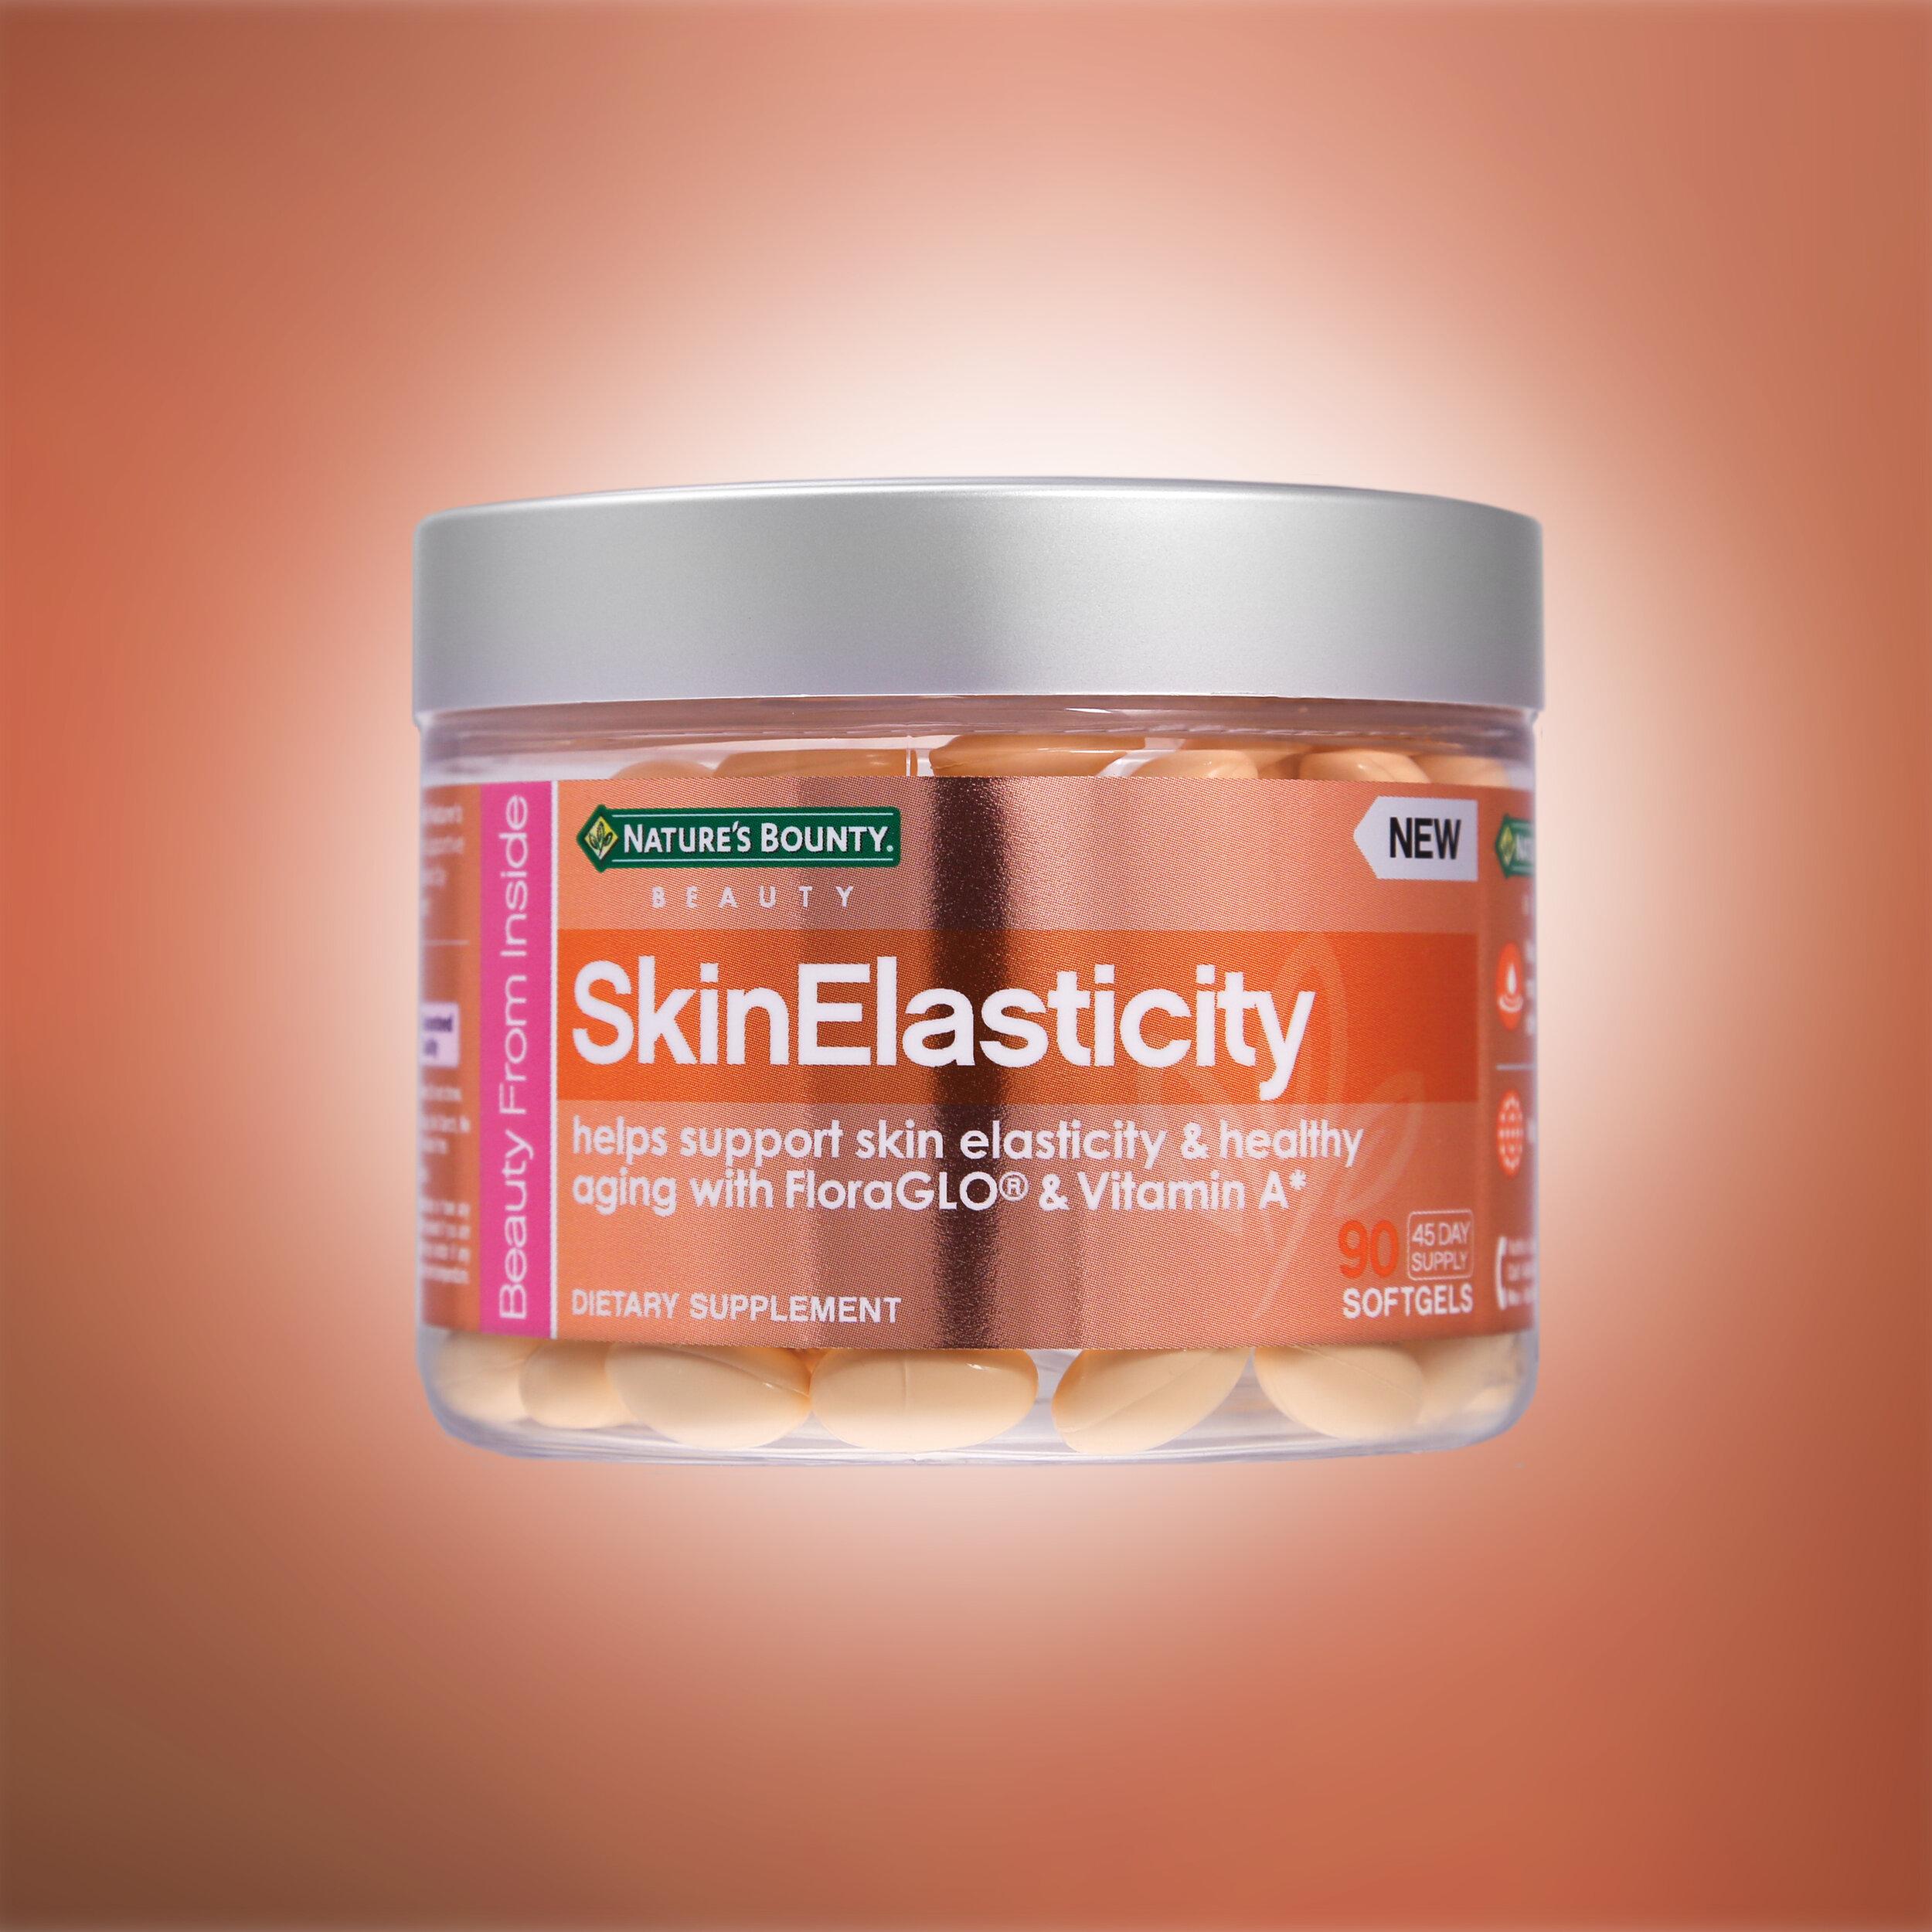 BeautyGels SkinElasticity.jpg